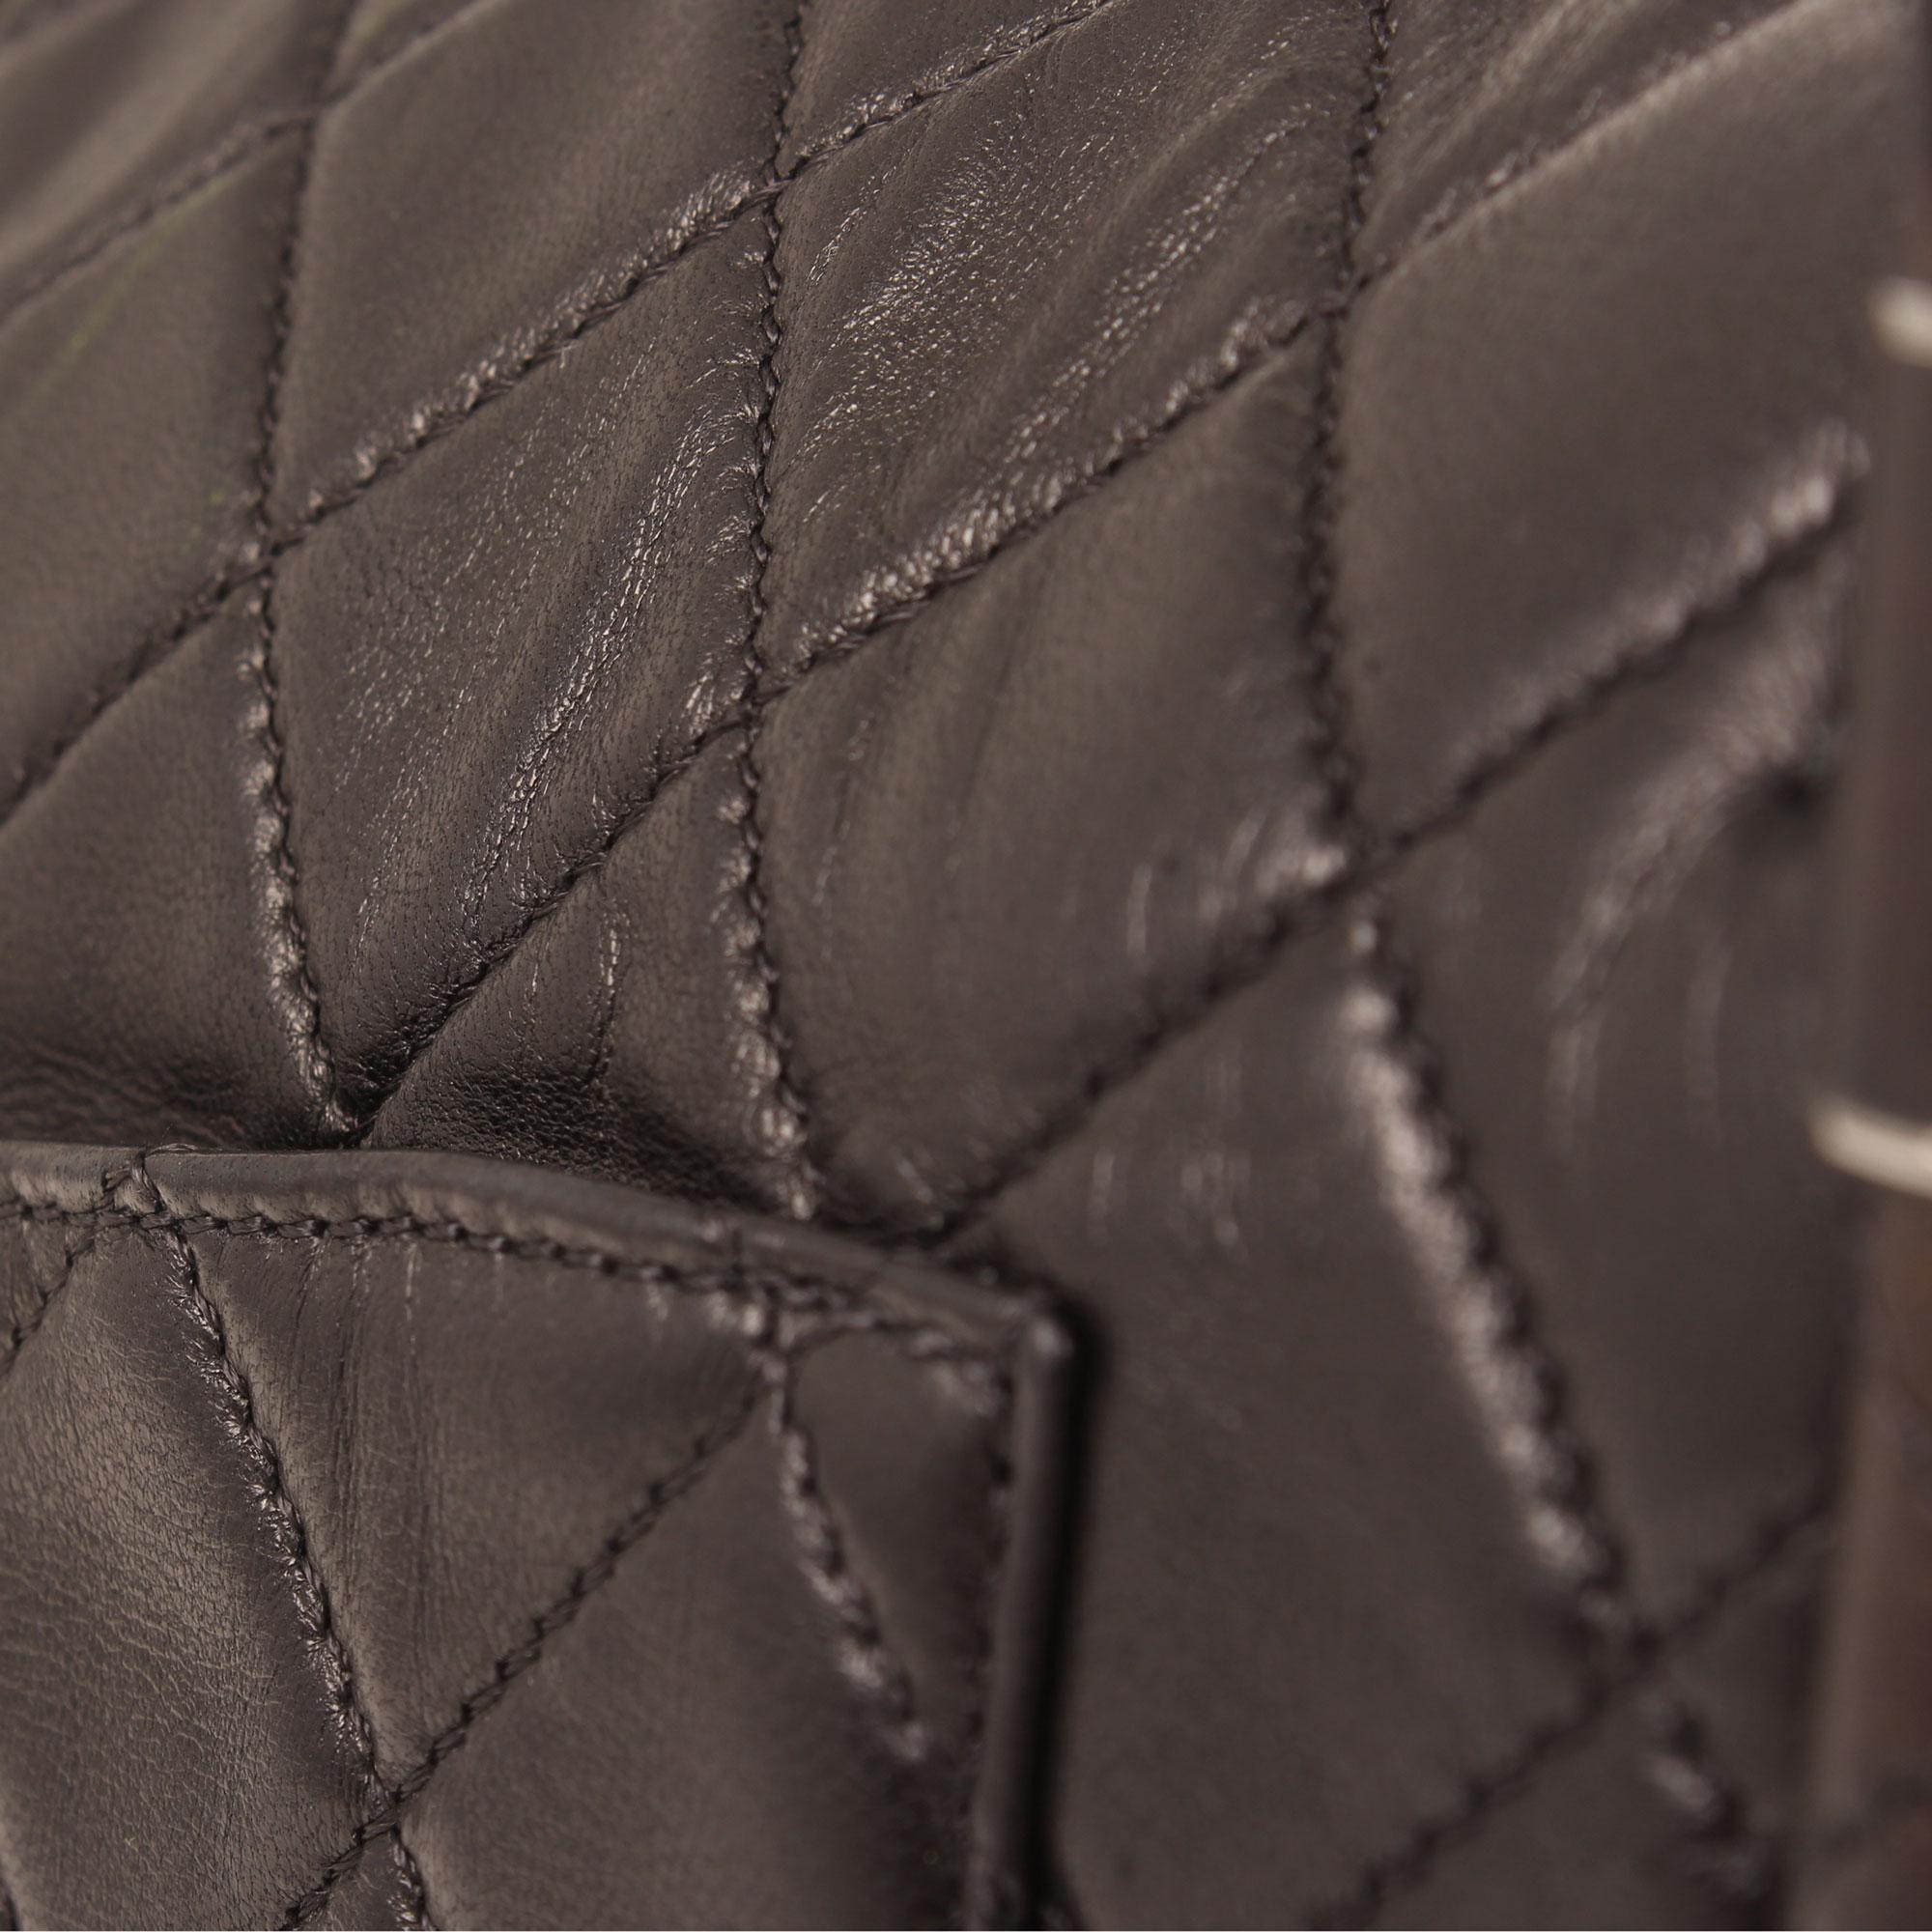 bag-chanel-hula-hoop-black-leather-detail